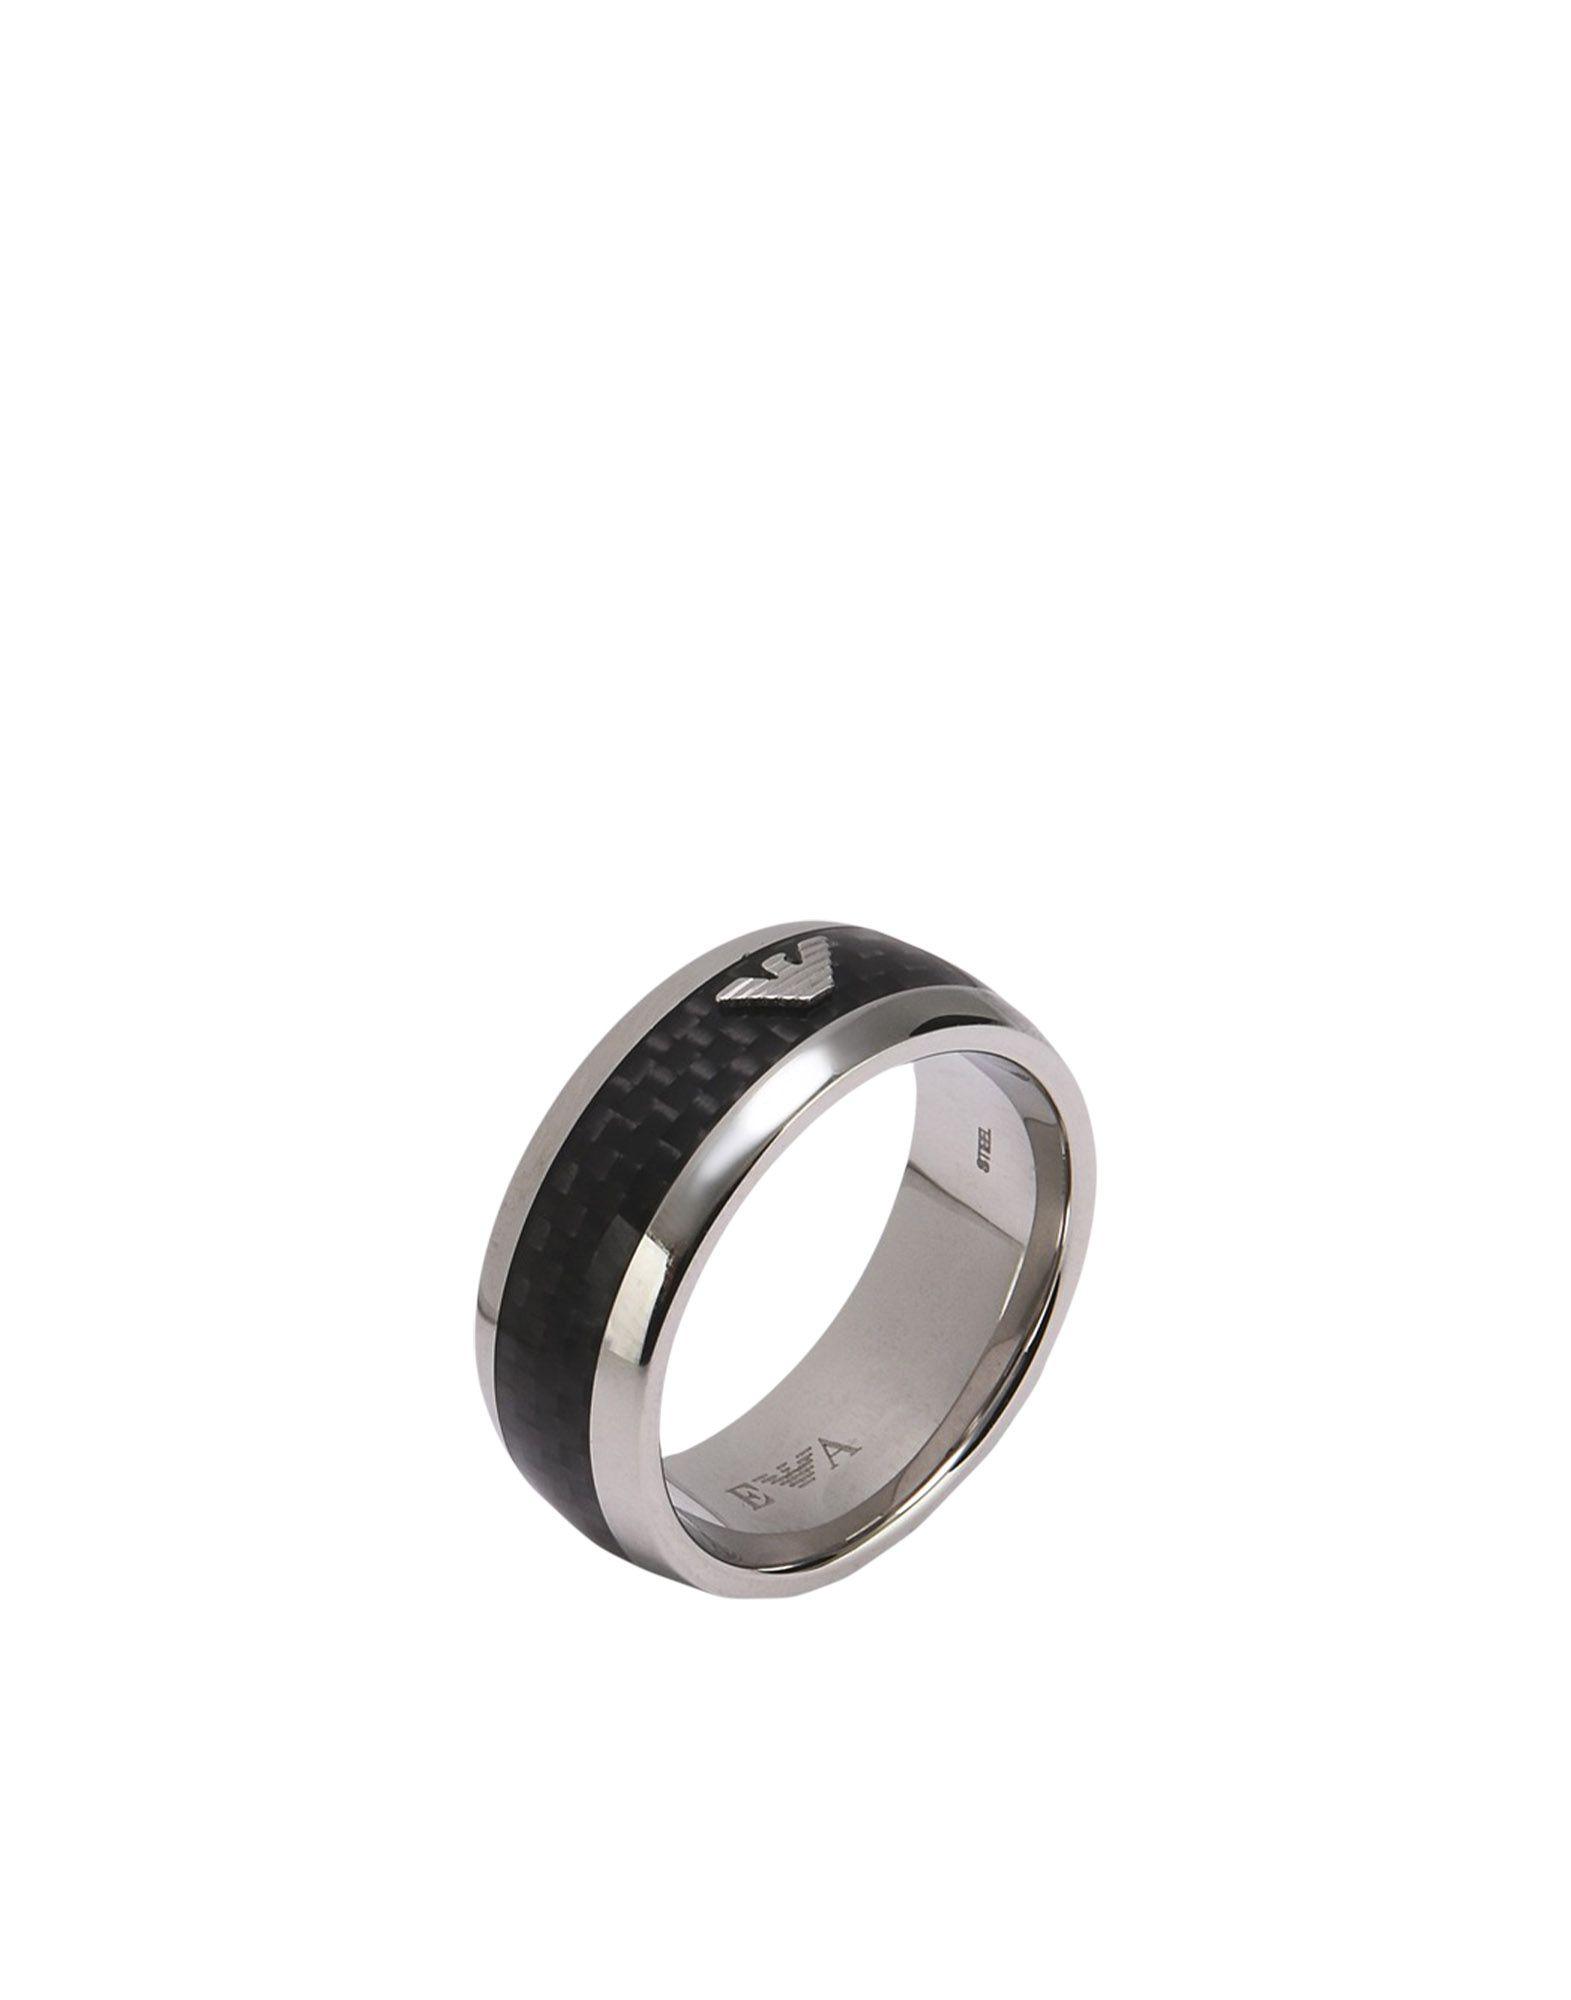 Emporio Armani Rings Black